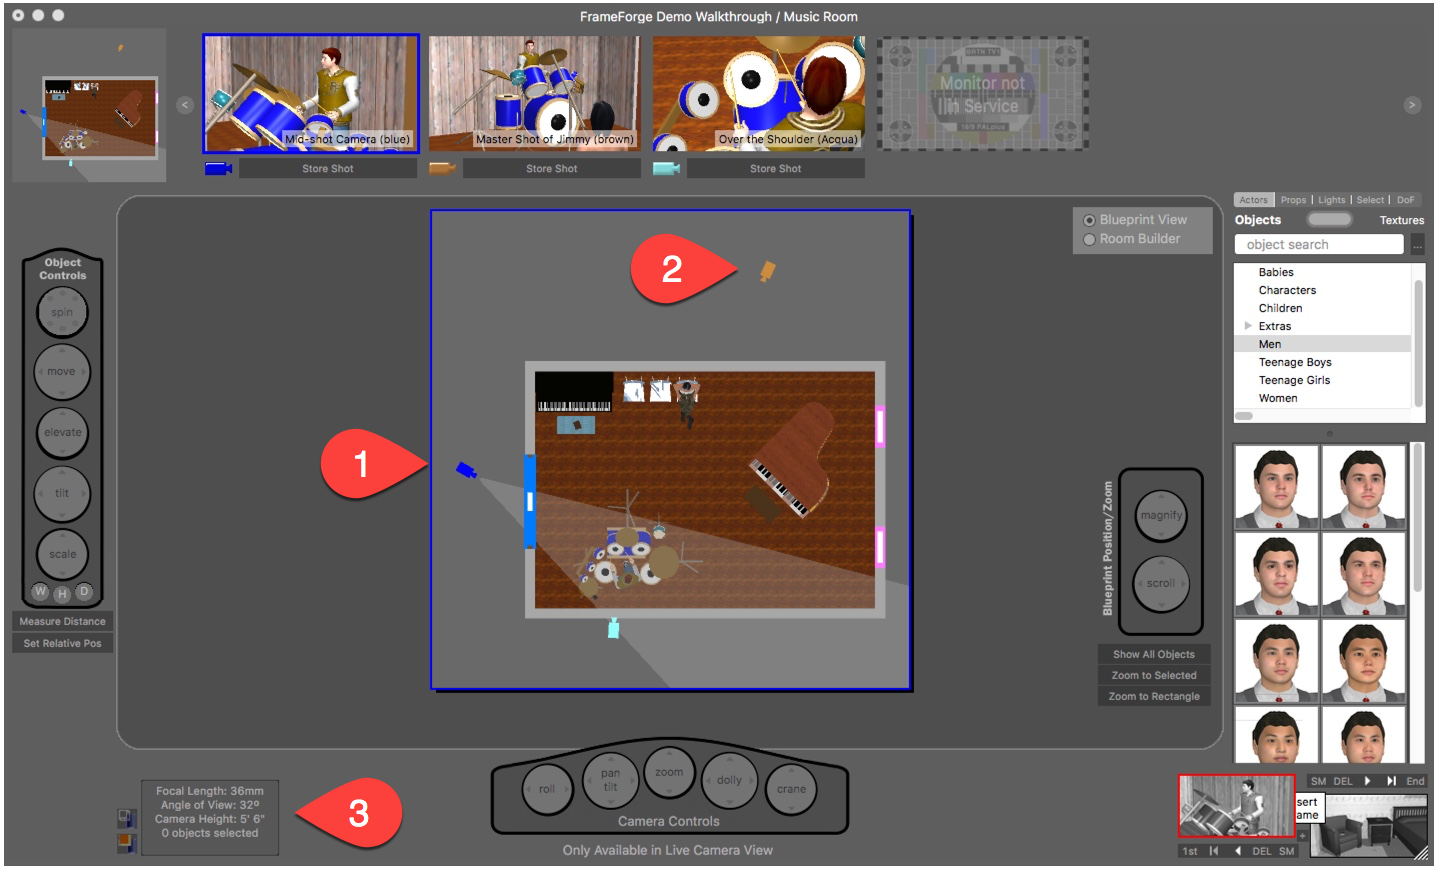 Blueprint View - FrameForge